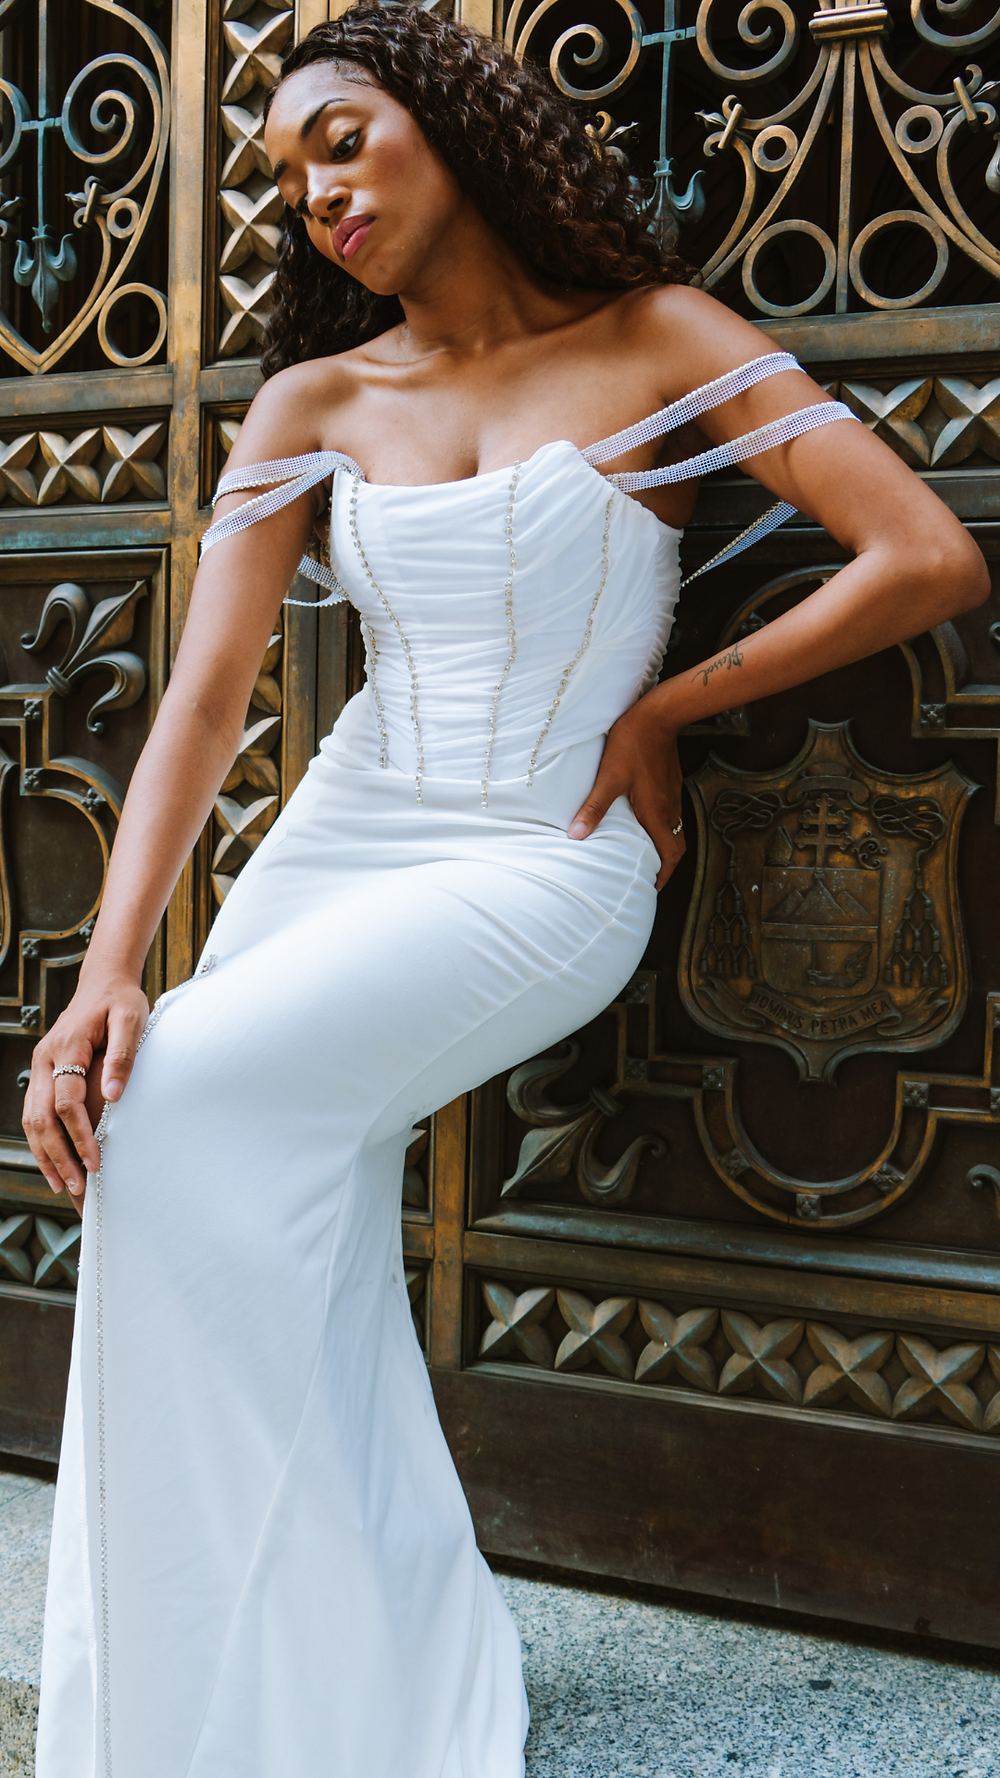 jana-ele-s-angel-collection-september-2021-new-york-fashion-week-nyfw